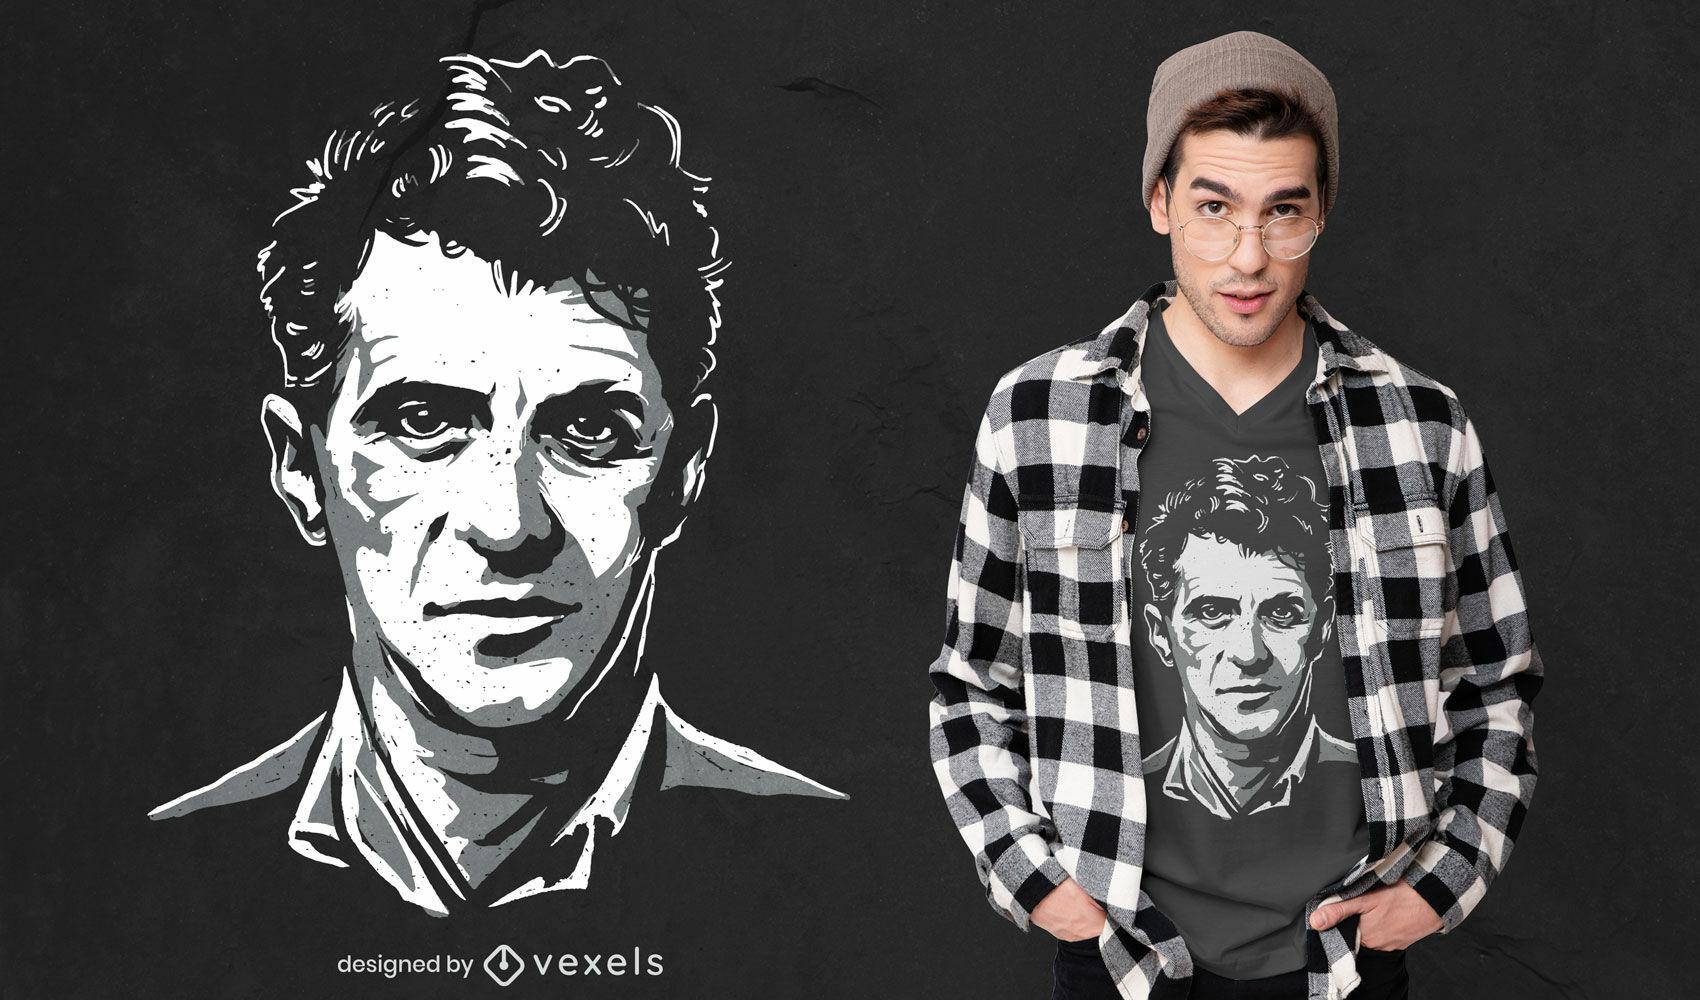 Diseño de camiseta monocromática de Ludwig Wittgenstein